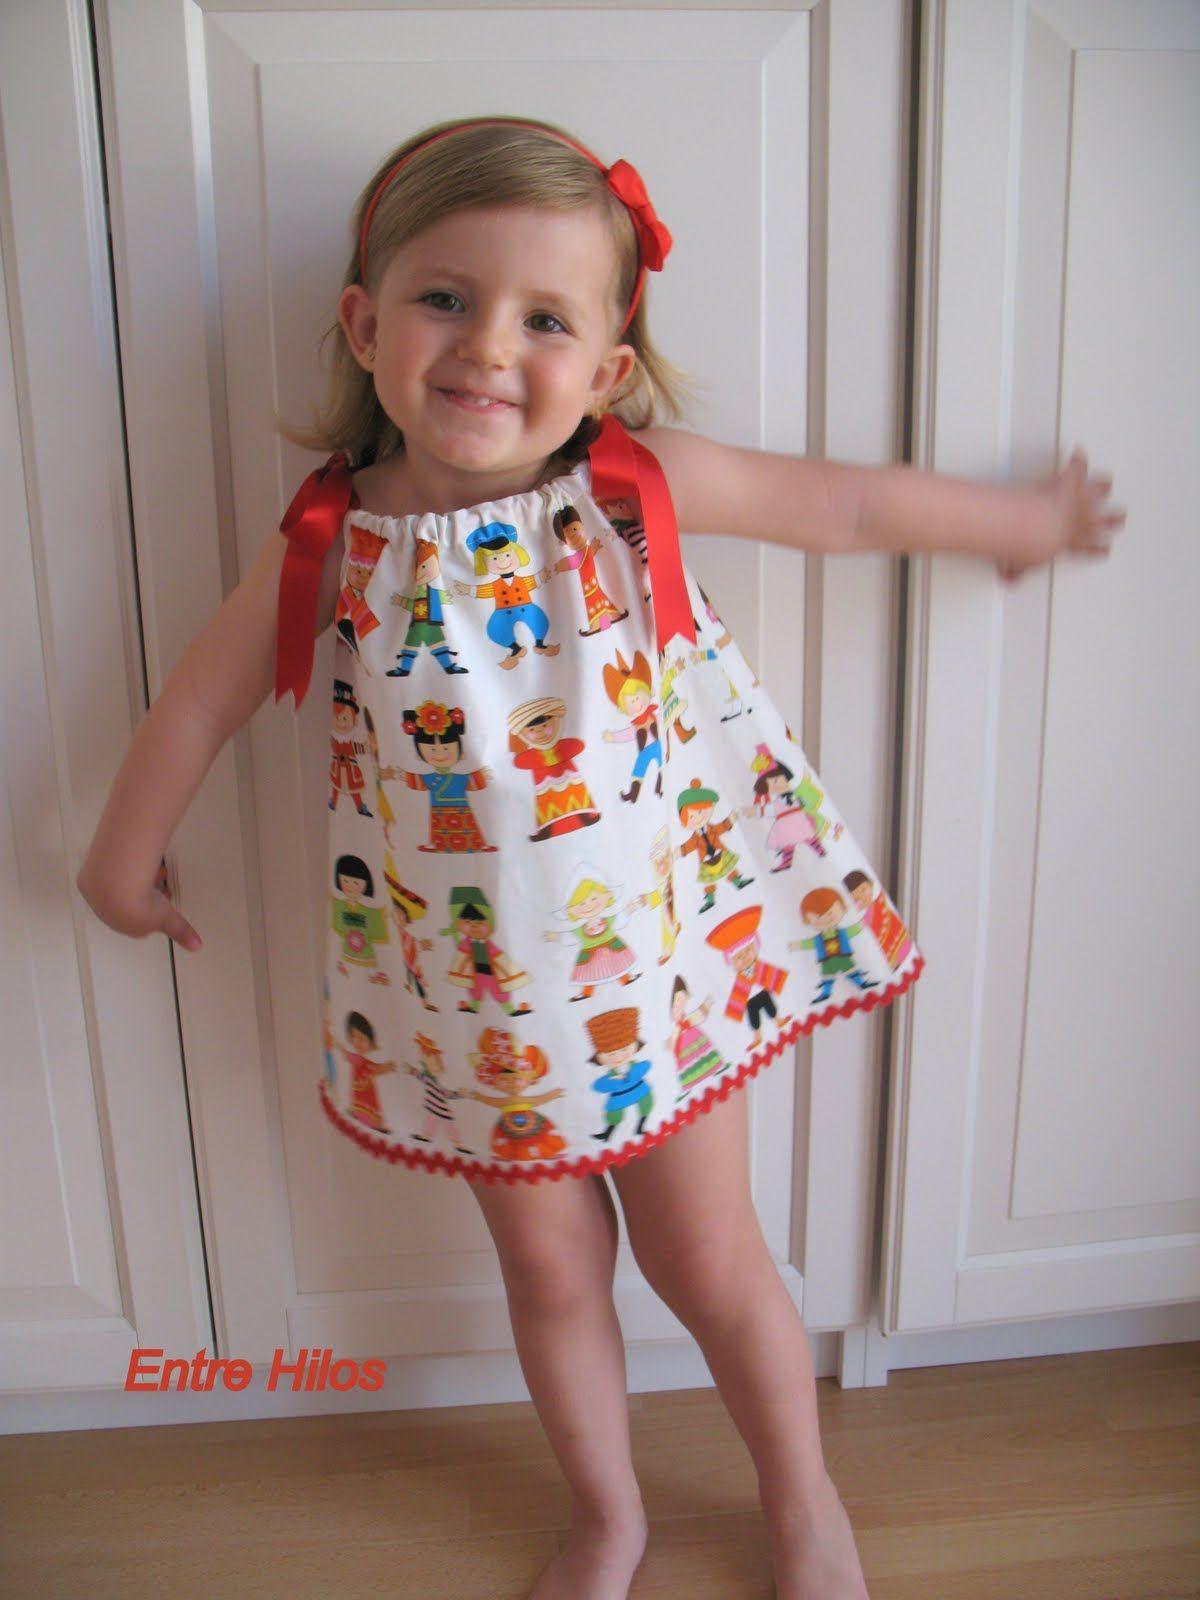 Entre hilos: Tutorial como hacer un pillowcase dress | My Love ...